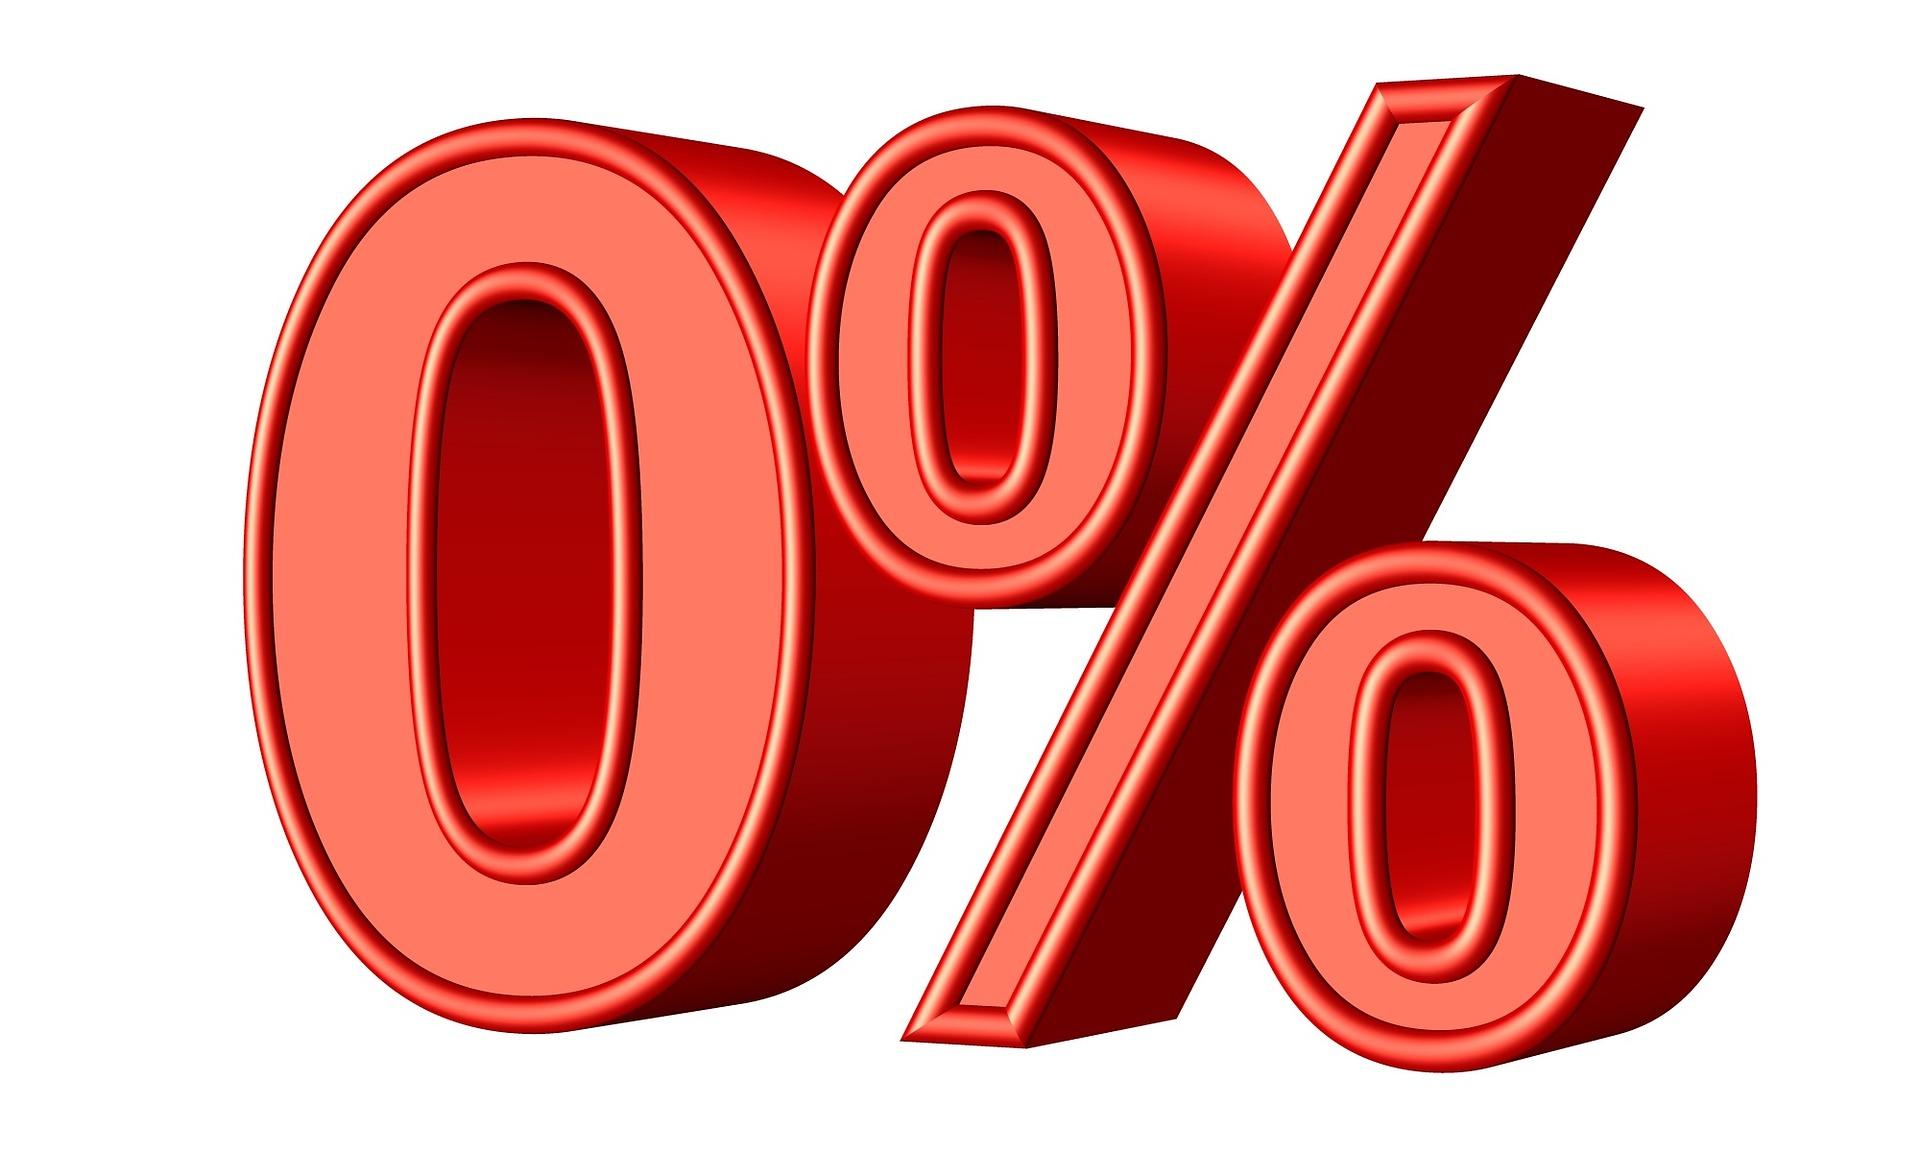 zero percent, in red